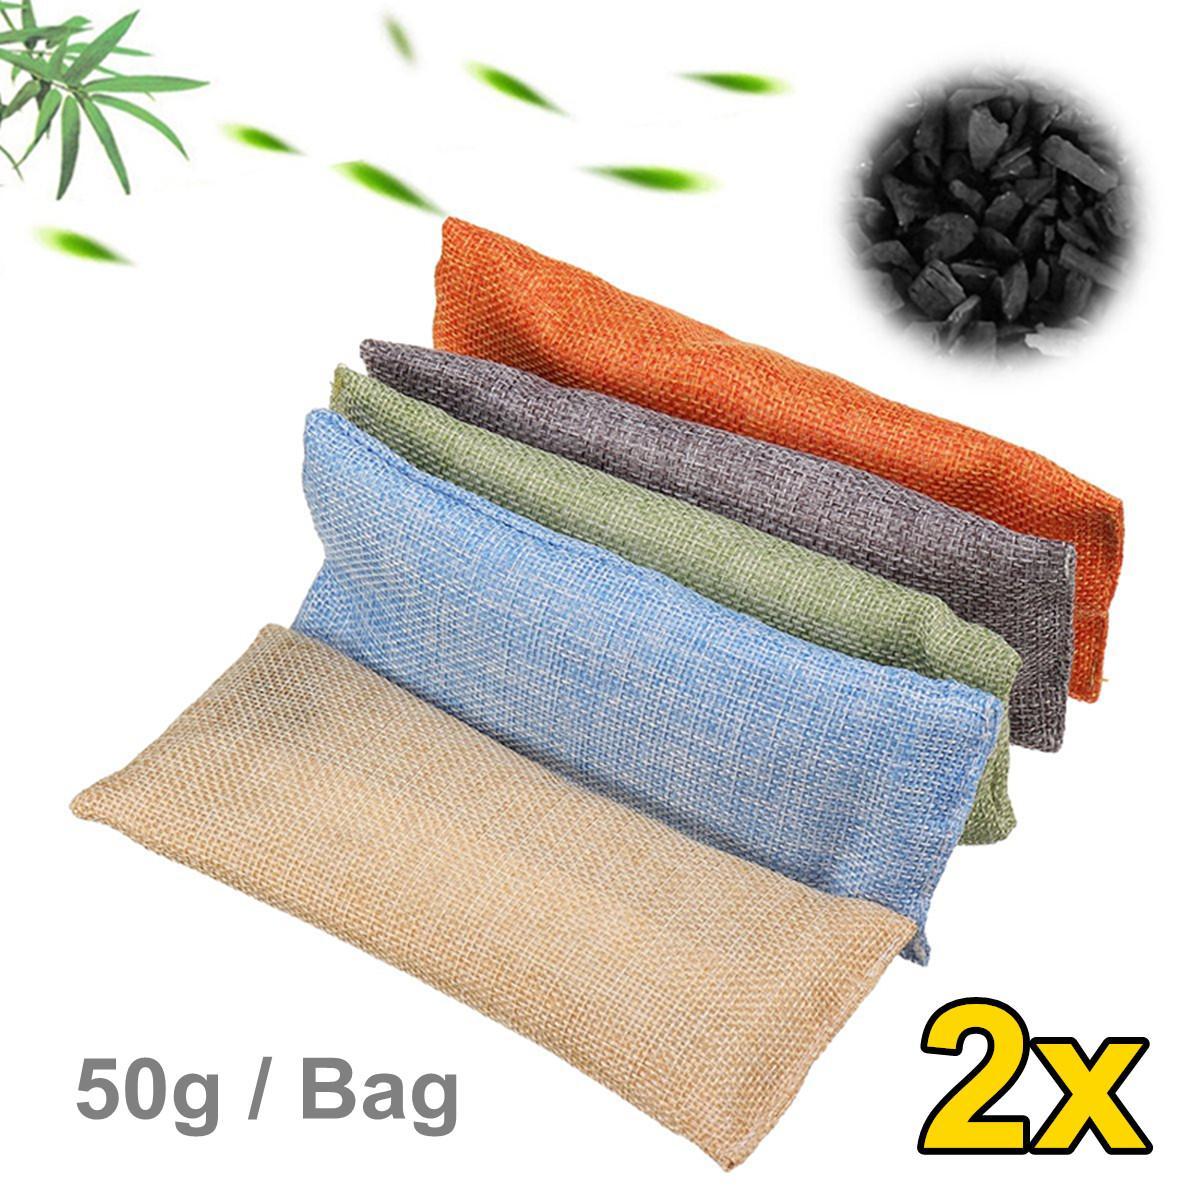 2 bolsas/set purificador de aire para el coche, zapatos para el hogar, deshumidificador de carbón de bambú, eliminador de olores, bolsa purificadora de aire, bolsas ambientadoras naturales